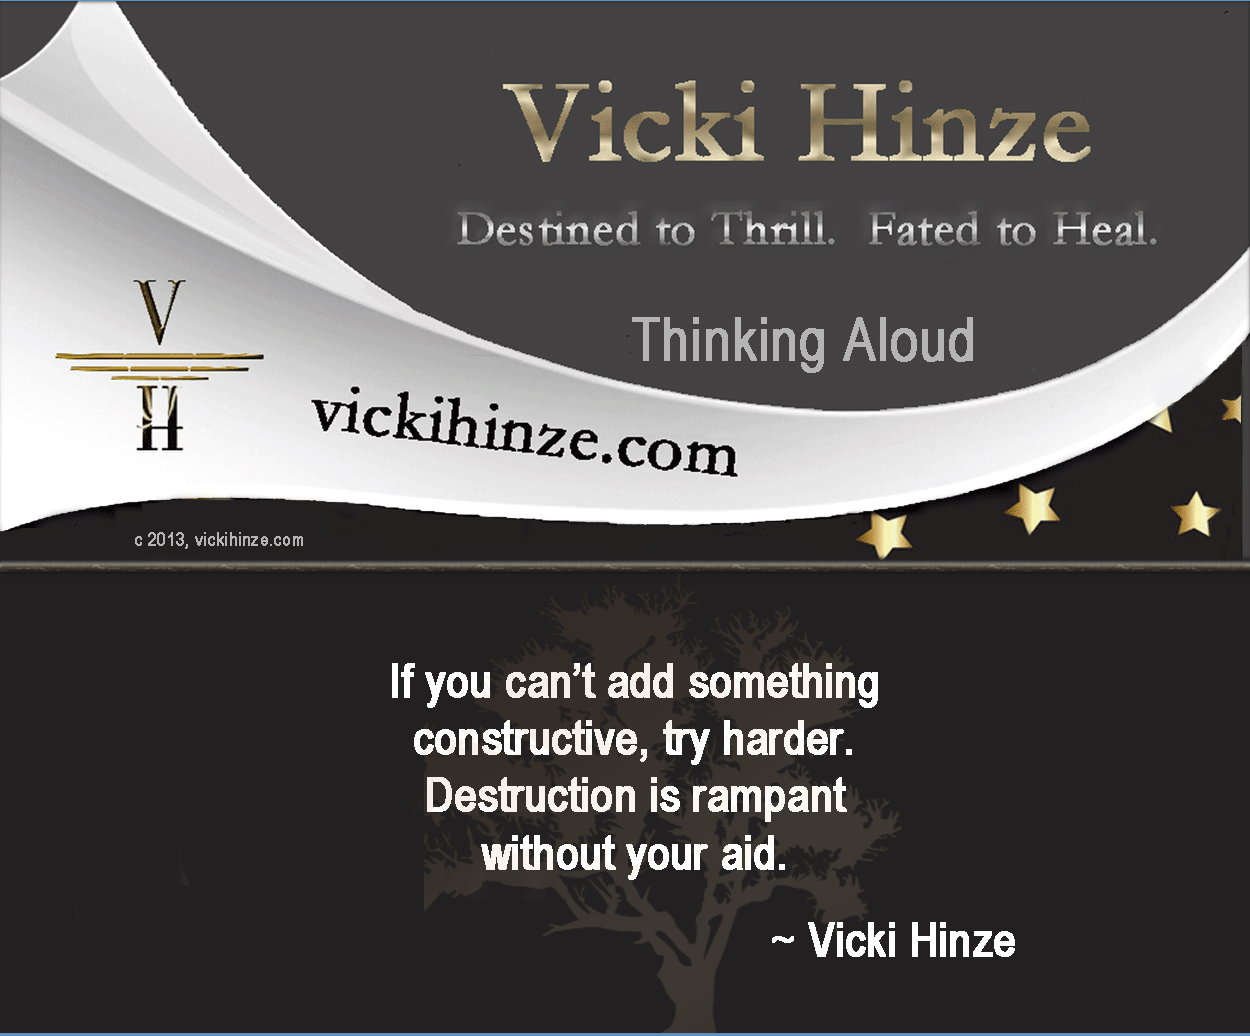 vicki hinze, constructive, destructive, thinking aloud